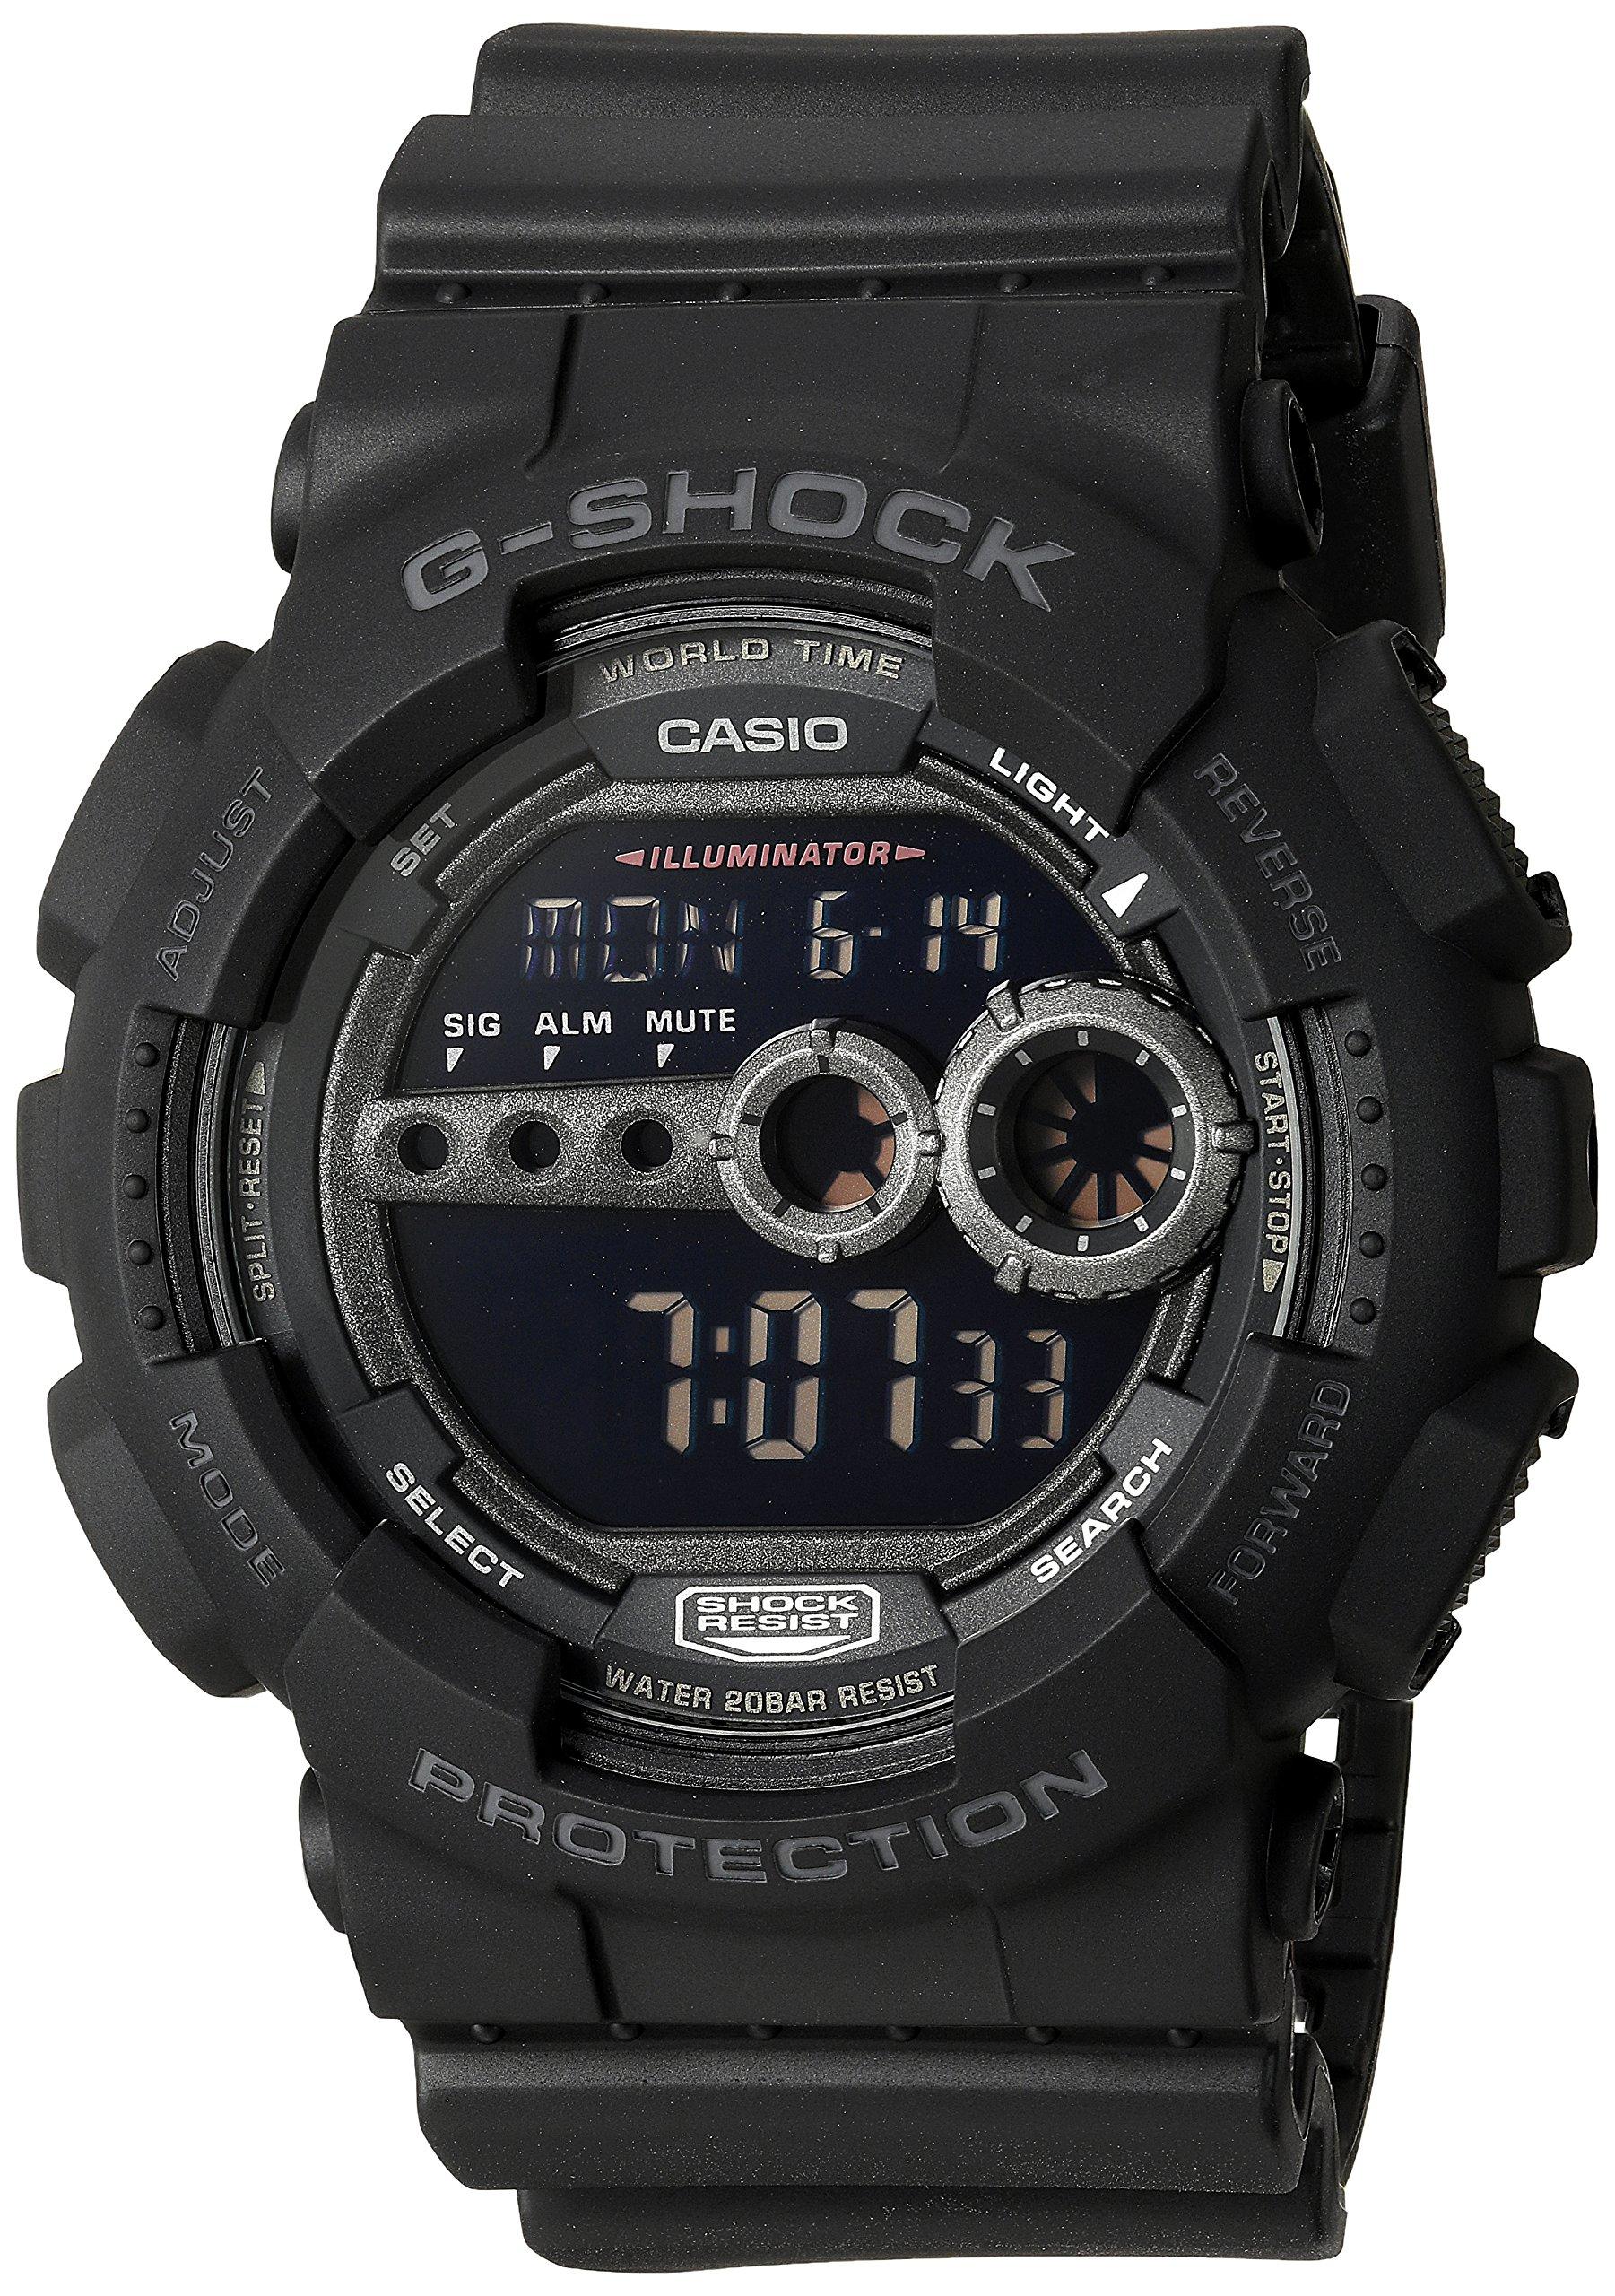 Casio Men's GD100-1BCR G-Shock X-Large Black Multi-Functional Digital Sport Watch by Casio